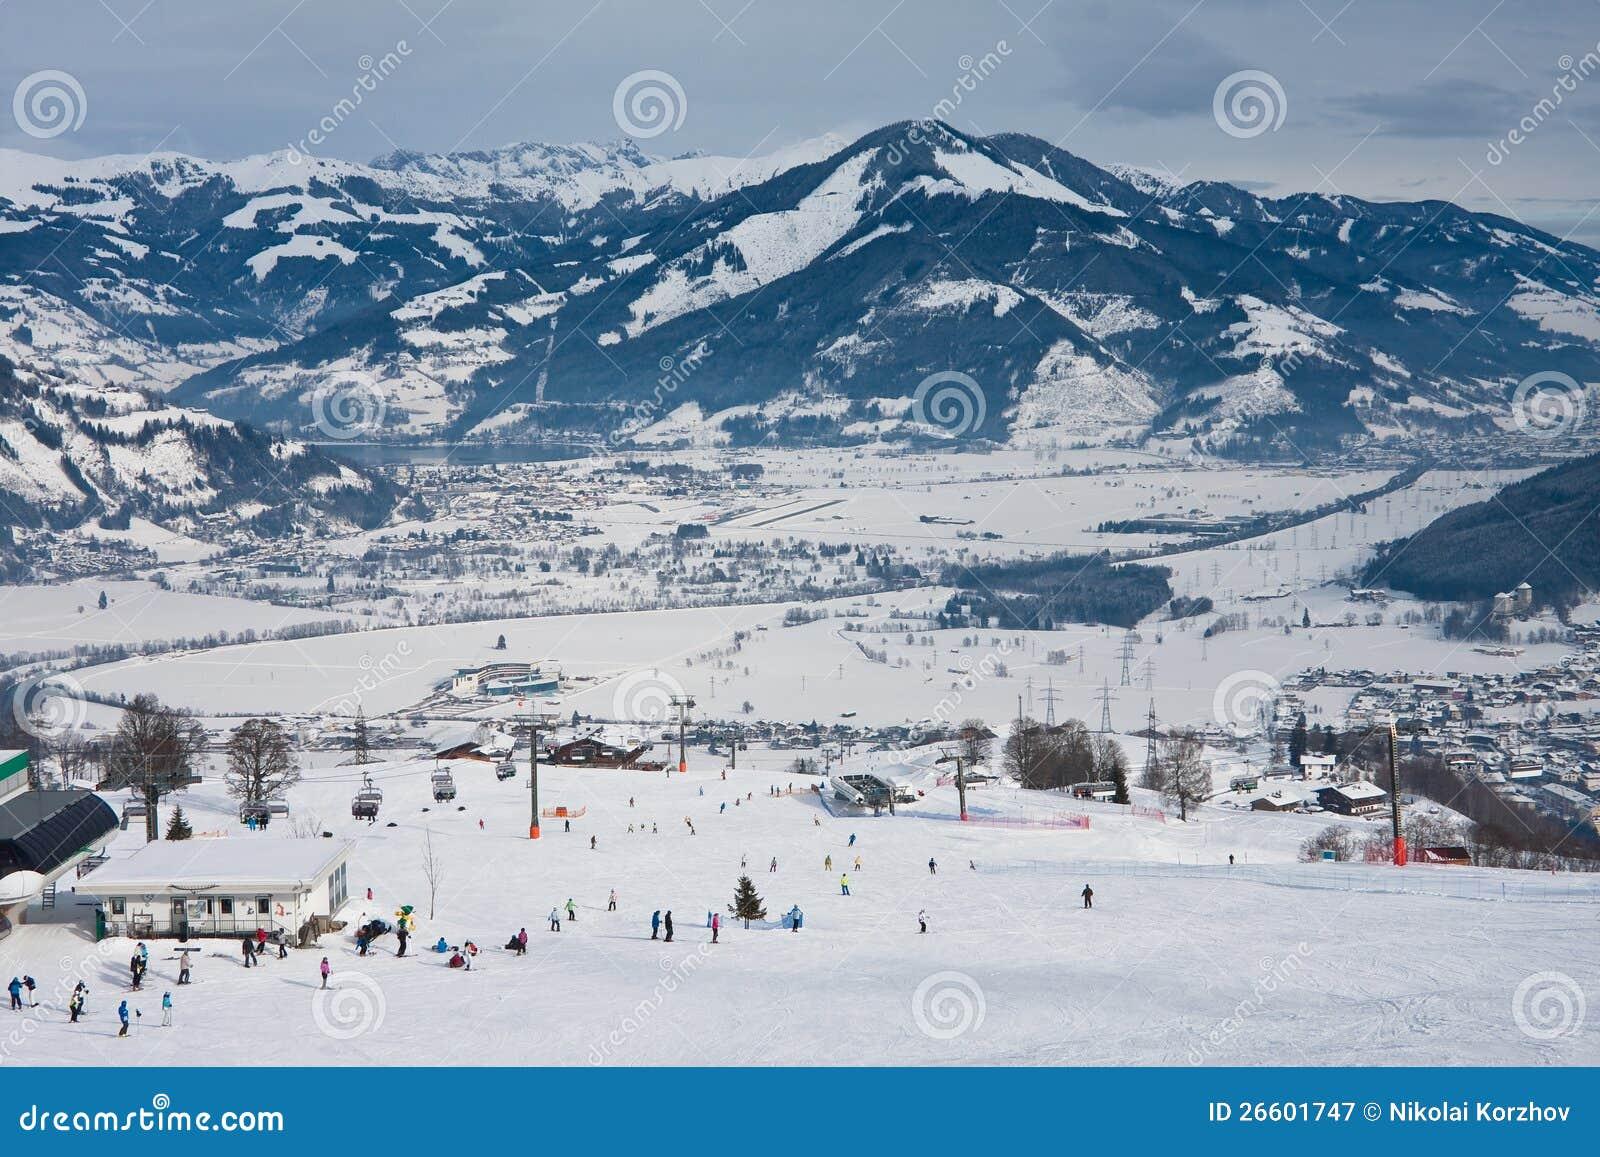 ski resort kaprun - maiskogel stock image - image of home, kaprun